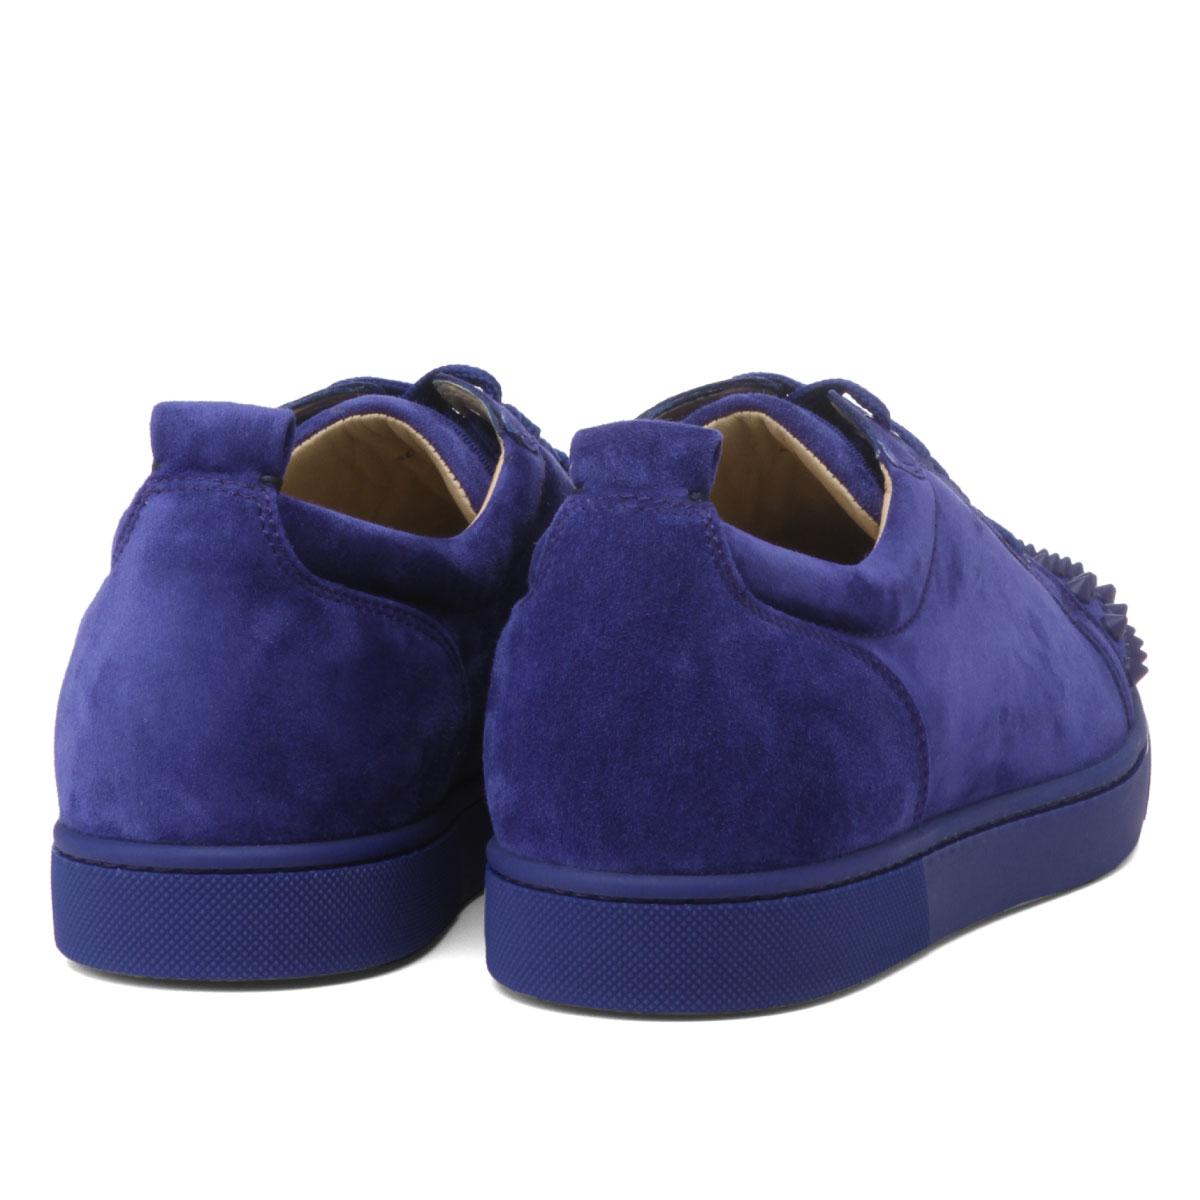 ab7515c8aef 1180051 クリスチャンルブタン Christian Louboutin shoes men V083 sneakers LOUIS JUNIOR  SPIKES FLAT Lewis Junius pike staple fiber rat ...